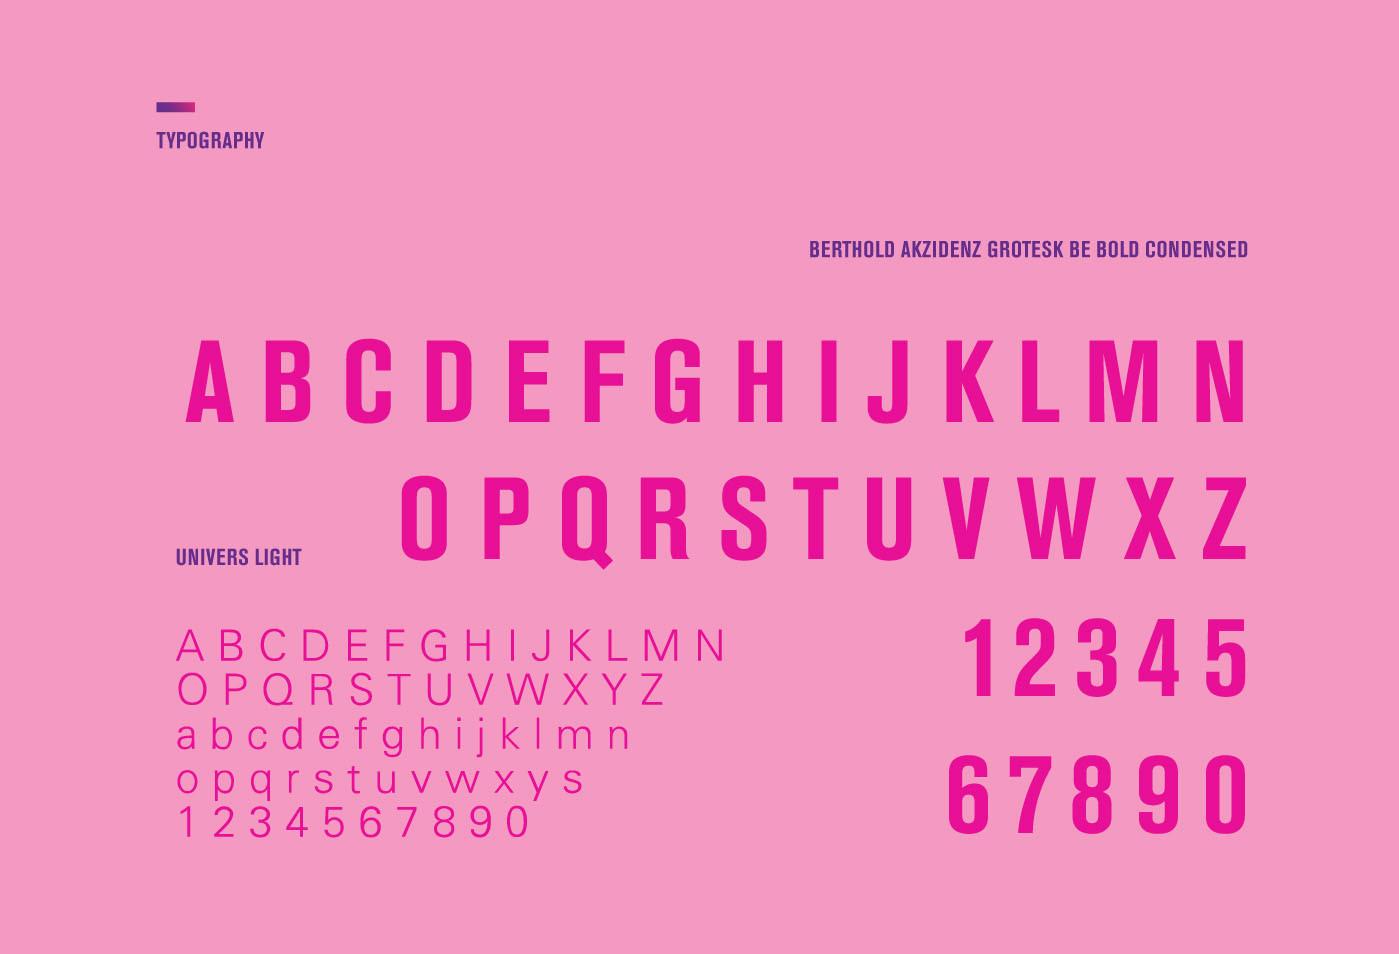 strive-brand-alphabet.jpg